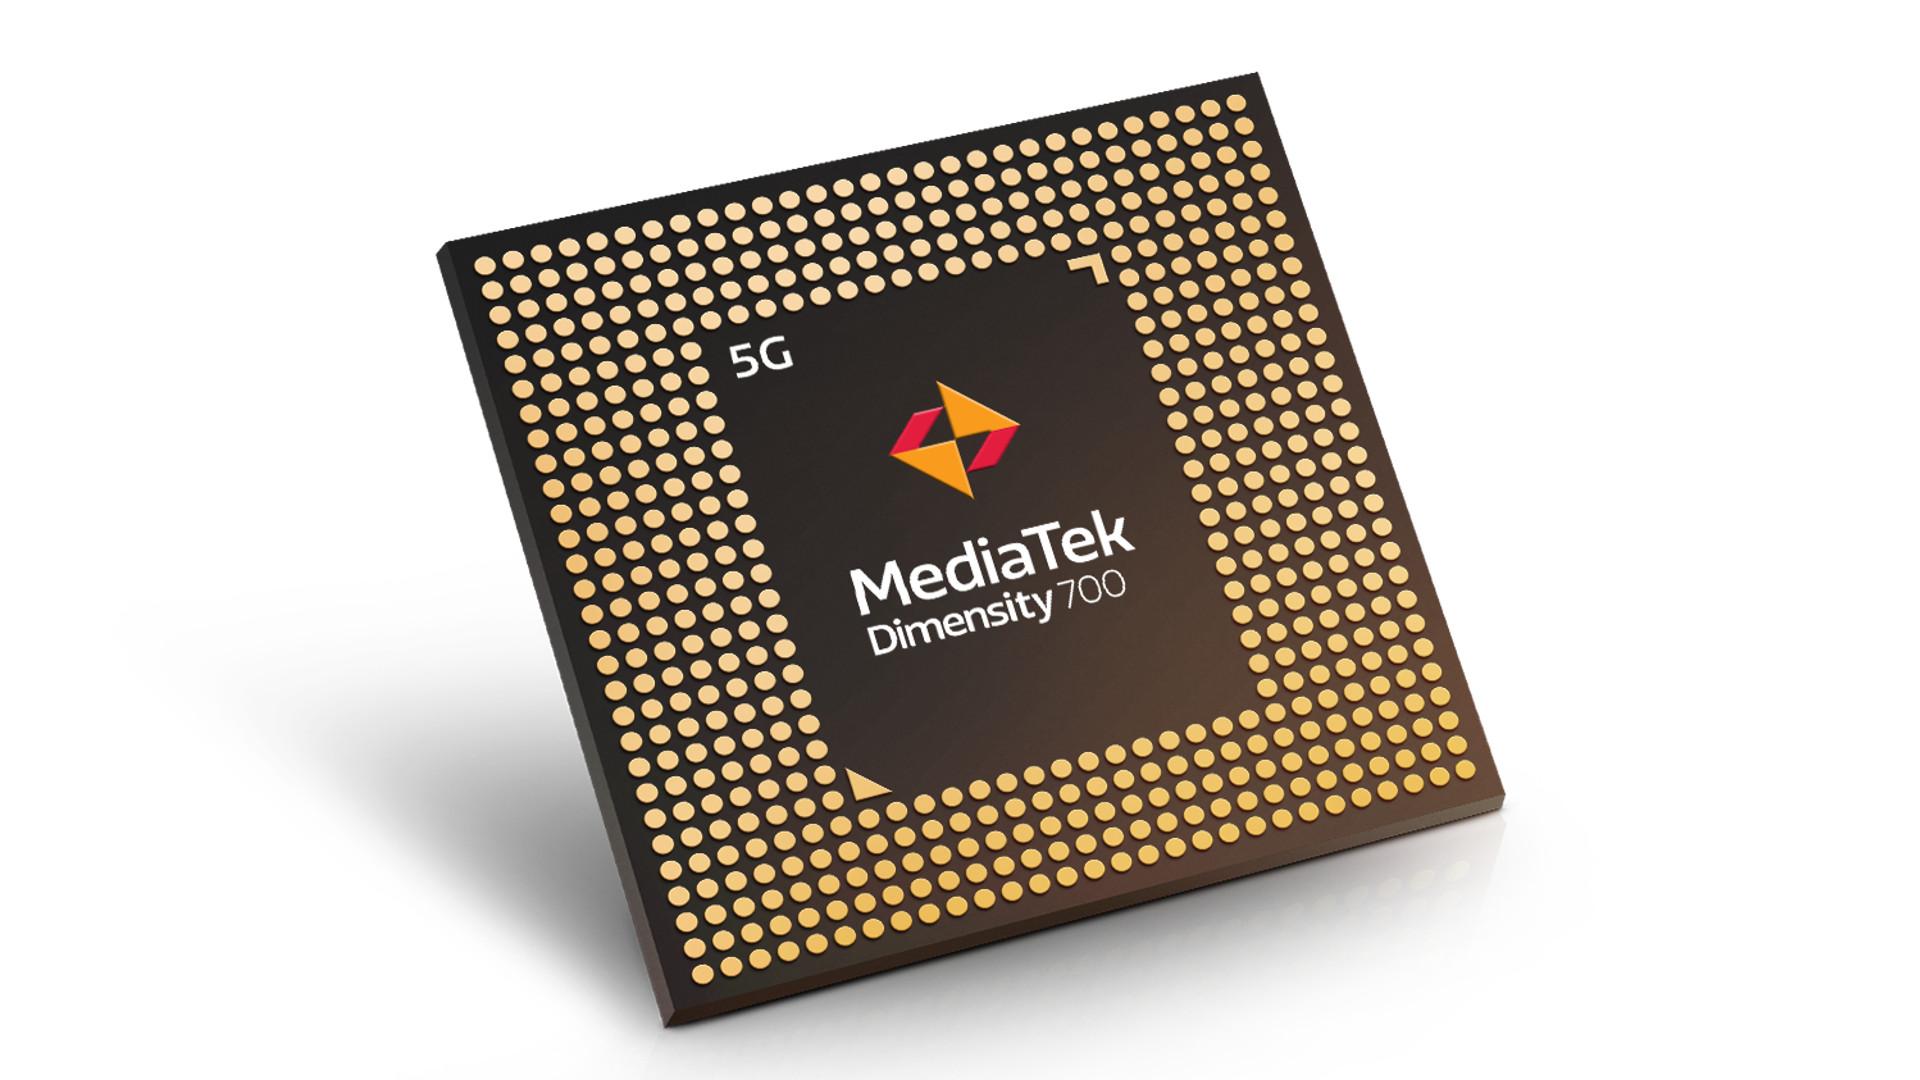 MediaTek Dimensity 700 announced: Cheap phones get more 5G love